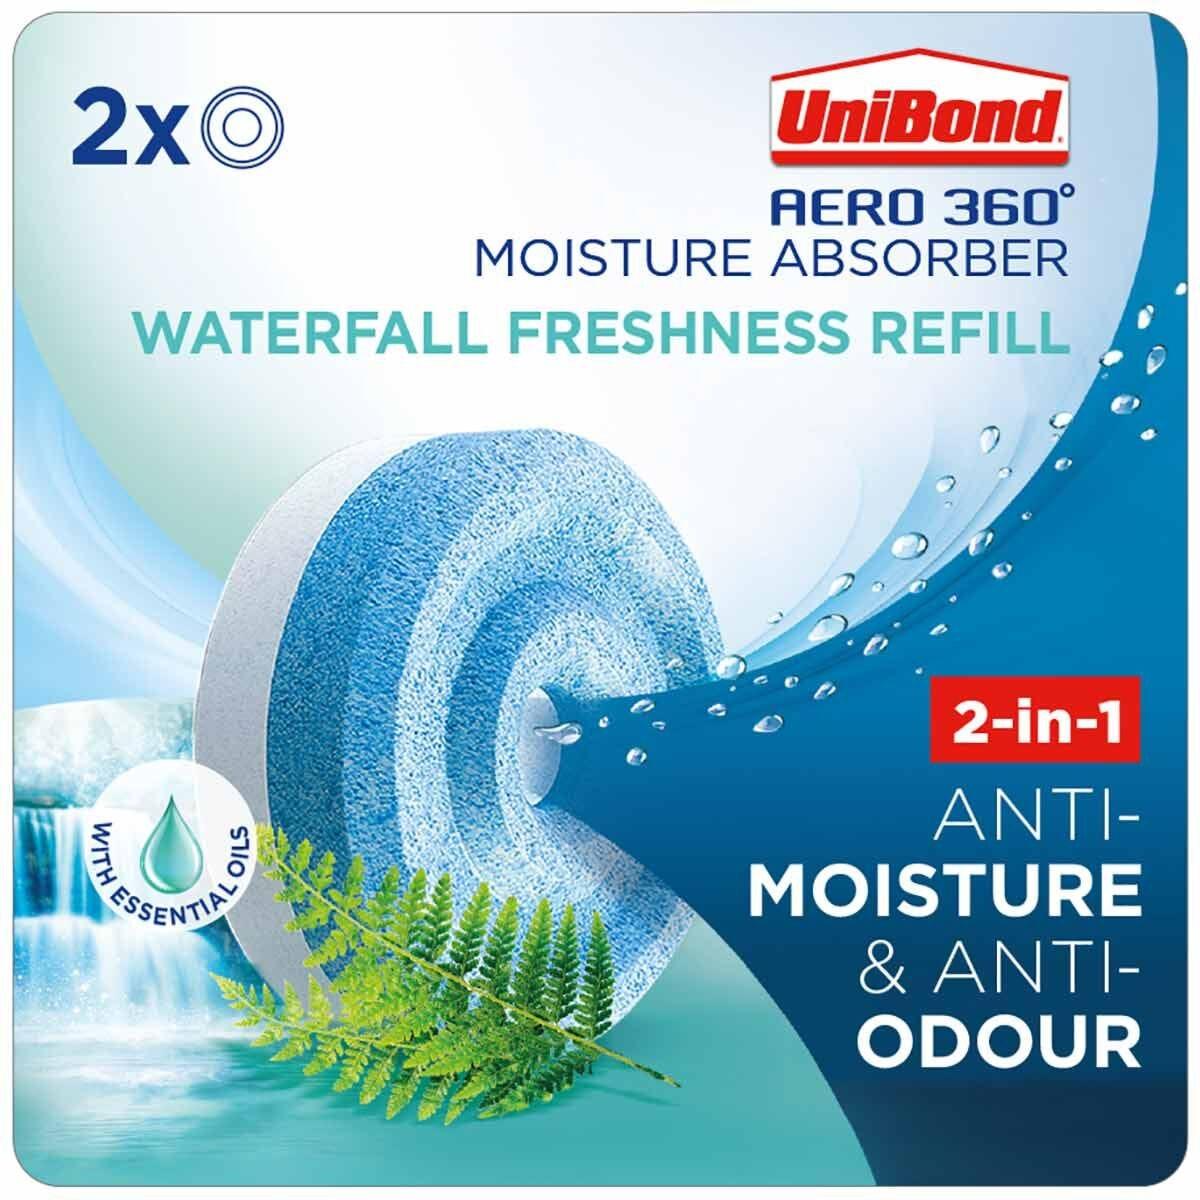 Unibond Aero 360 Moisture Absorber Waterfall Freshness Refills Pack of 2